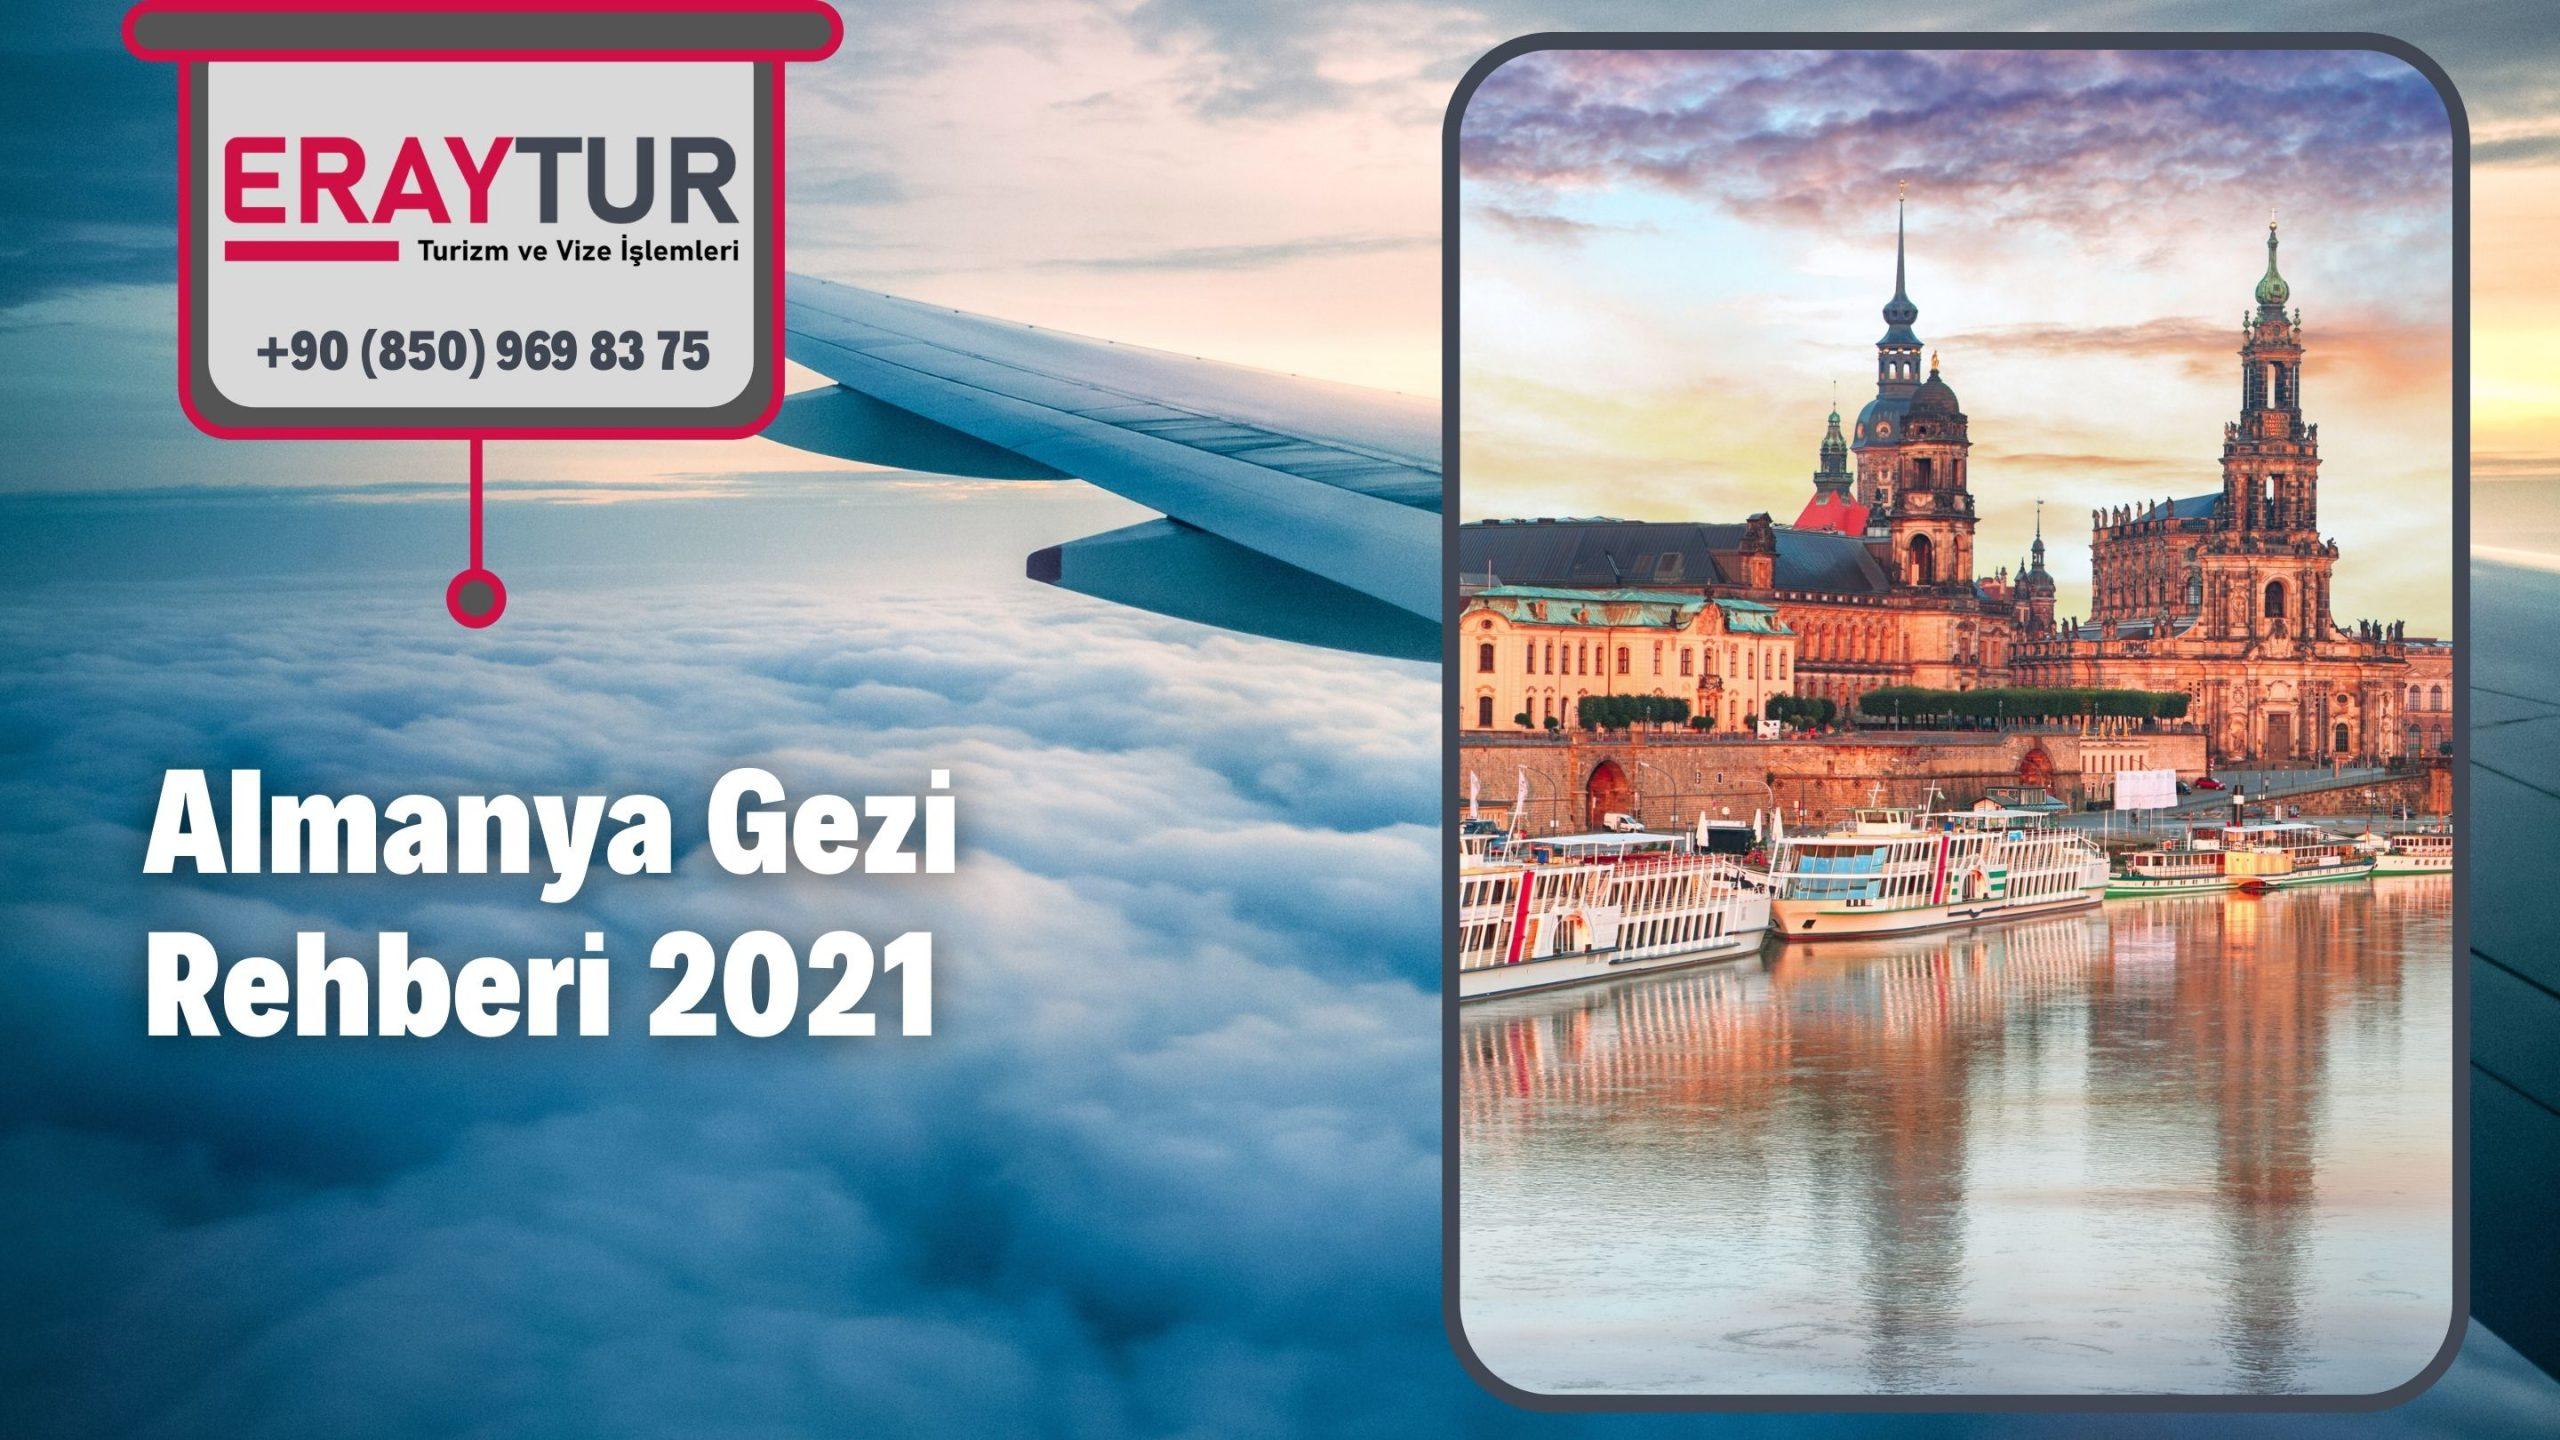 Almanya Gezi Rehberi 2021 1 – almanya gezi rehberi 2021 2 scaled